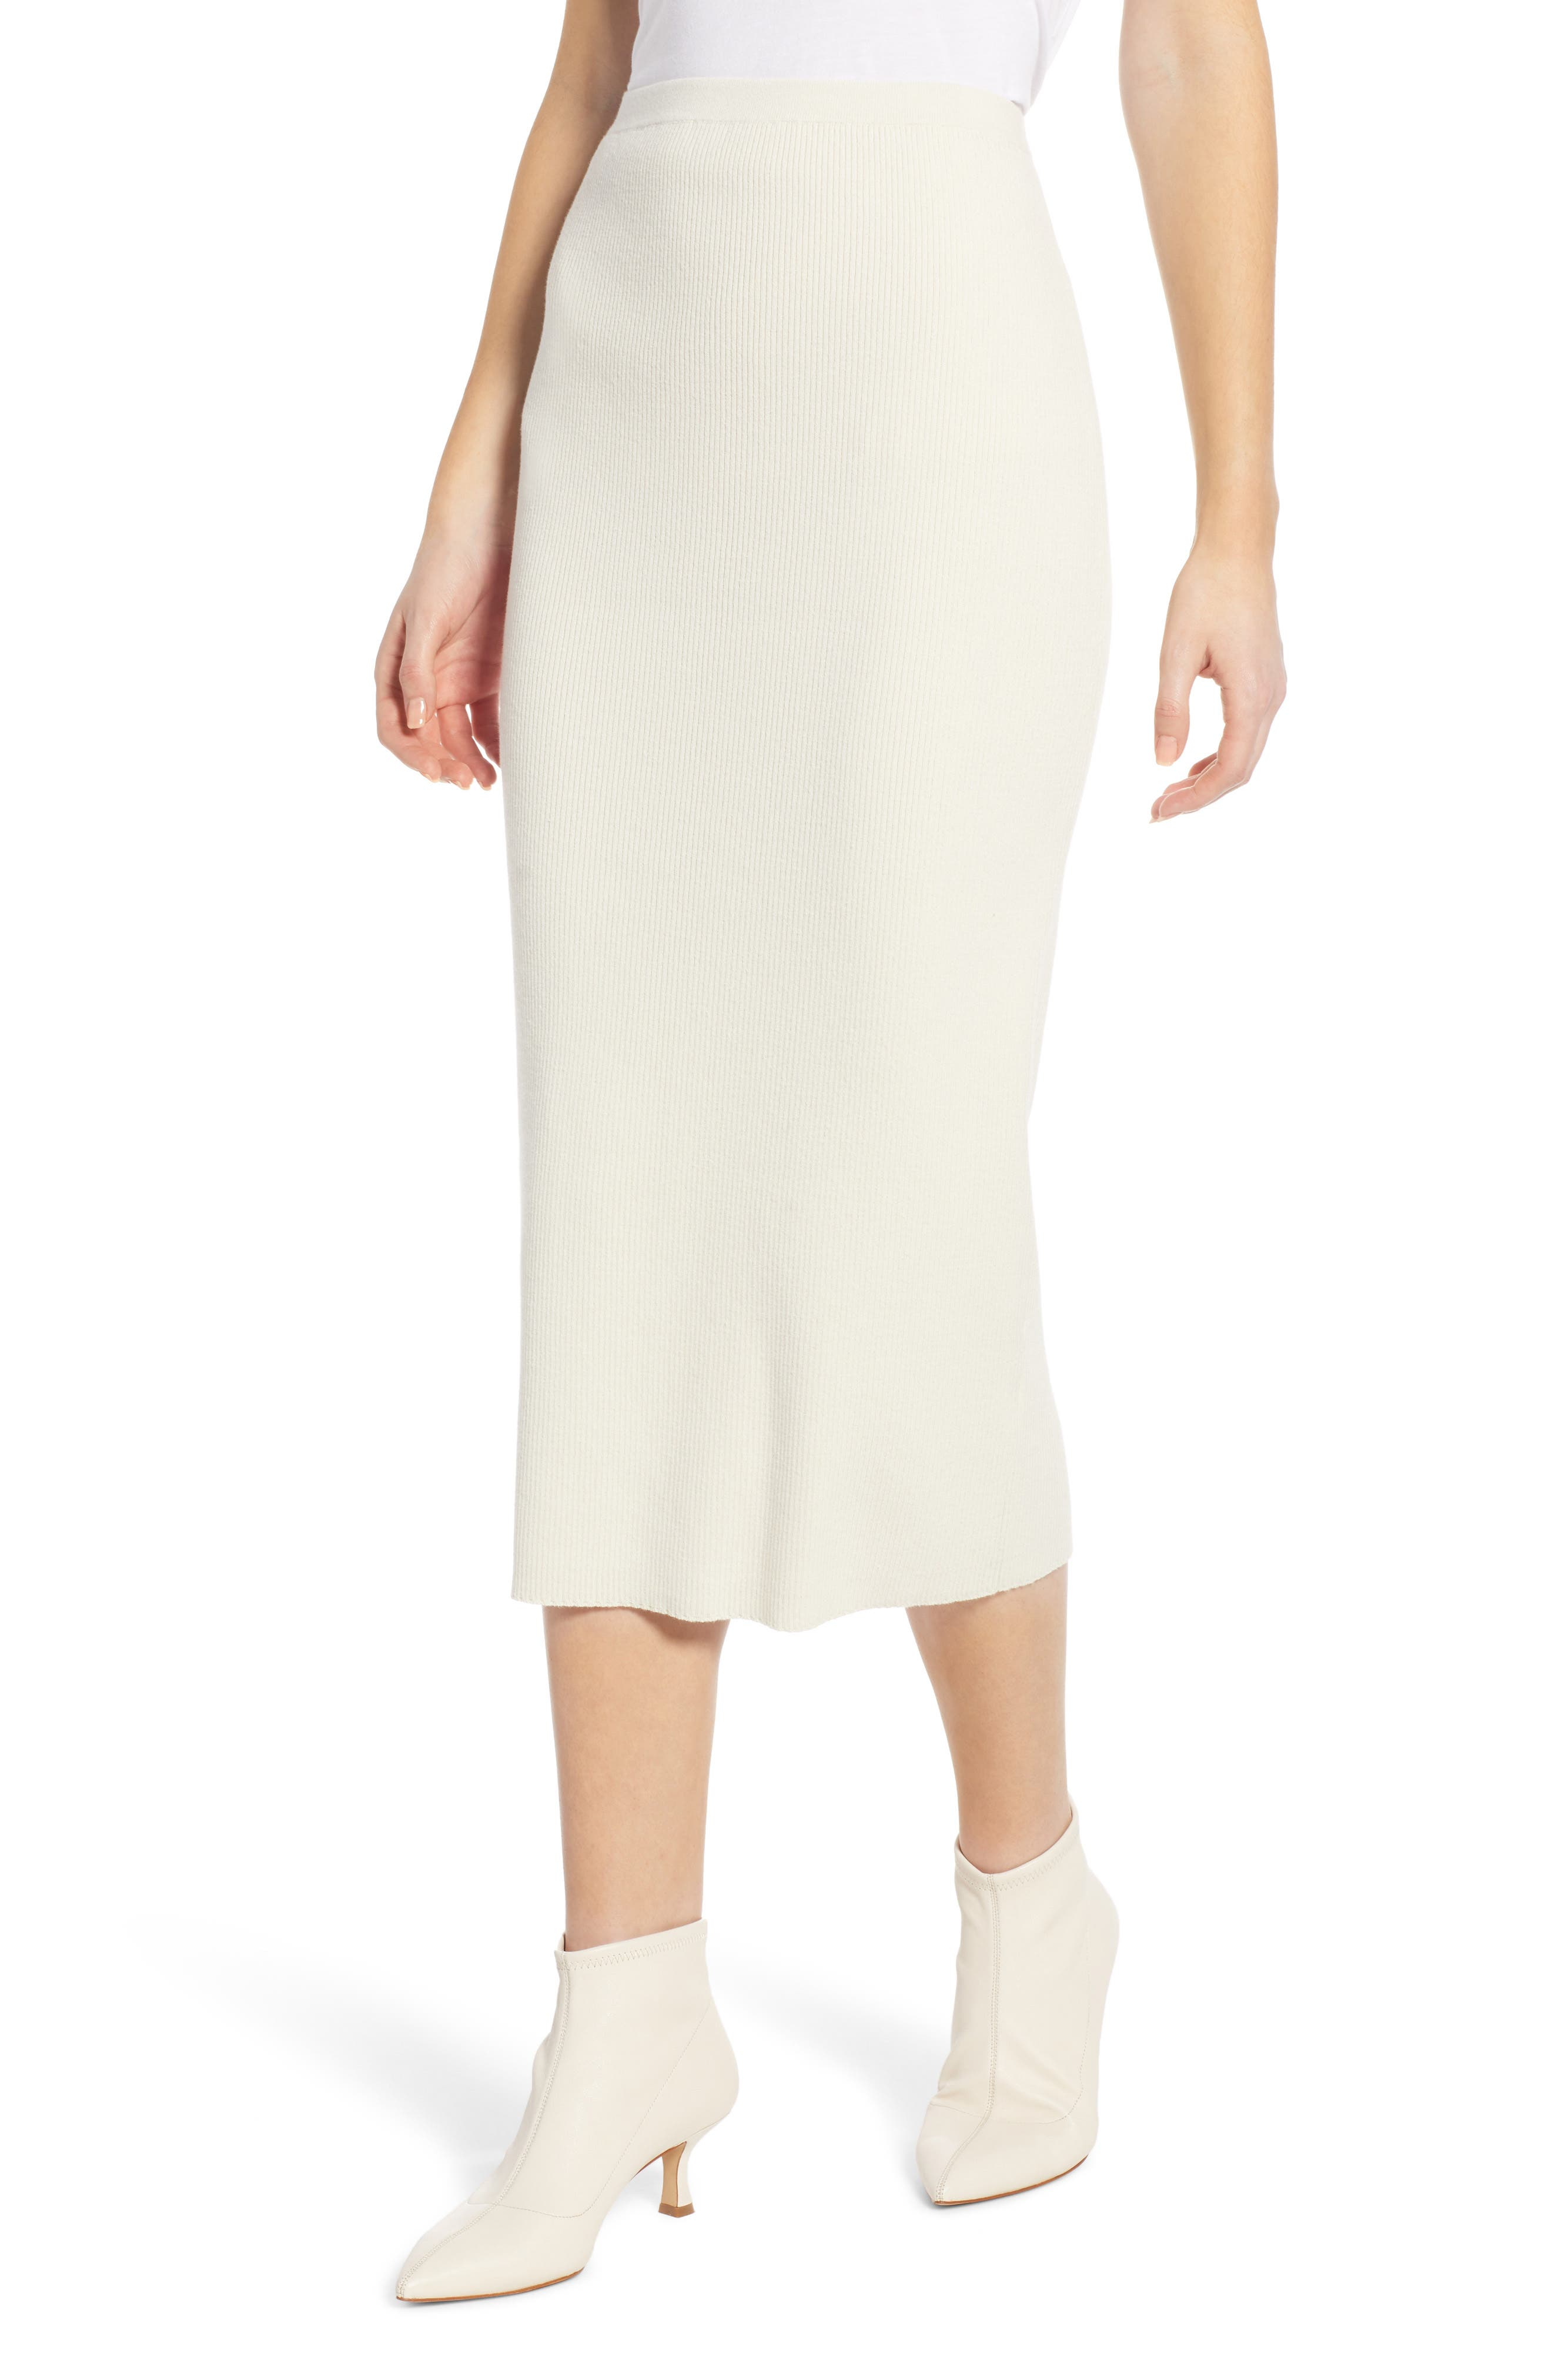 SOMETHING NAVY Rib Sweater Midi Skirt, Main, color, 900